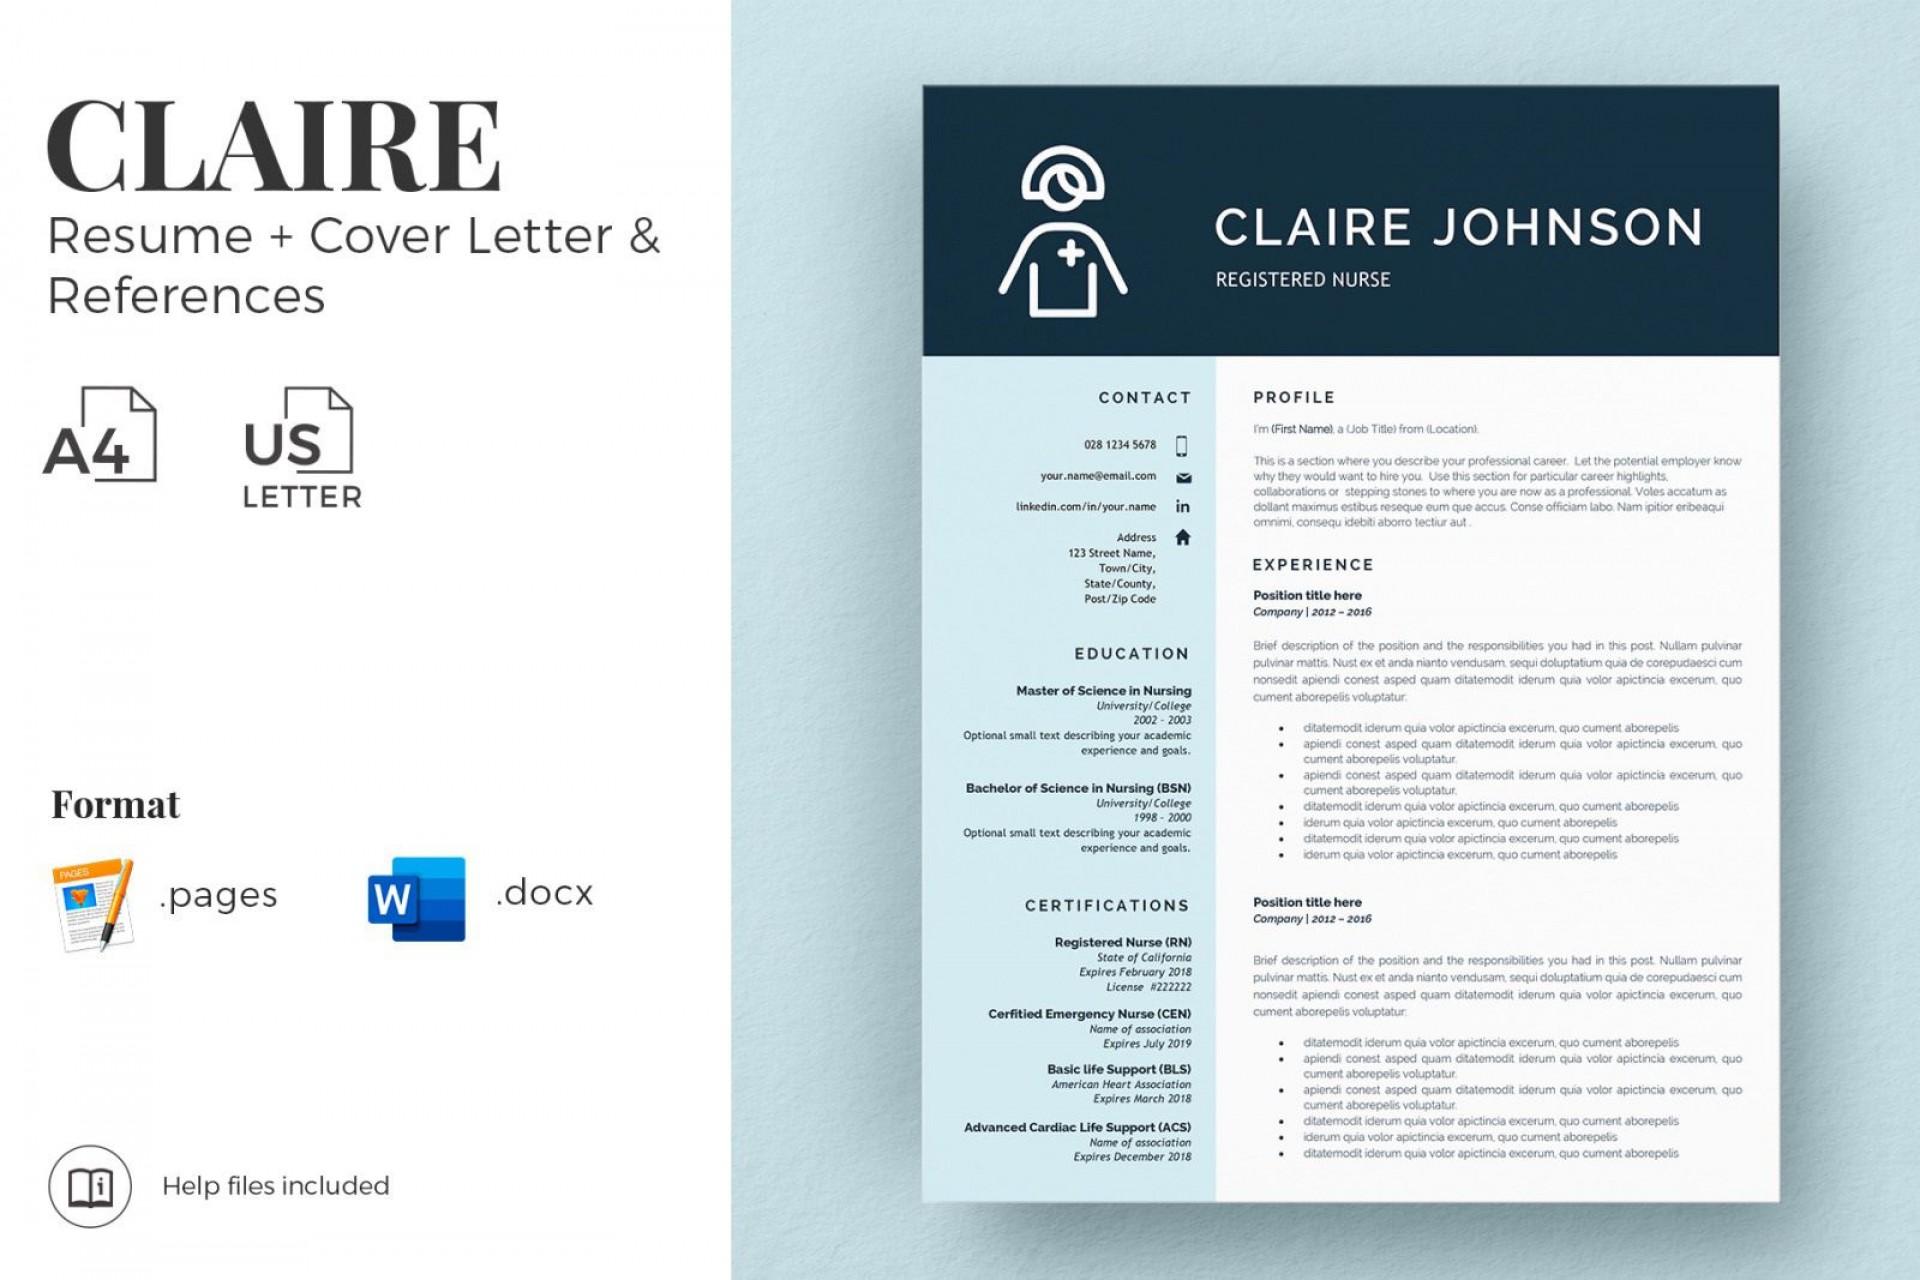 002 Incredible Nurse Resume Template Word High Definition  Cv Free Download Rn1920